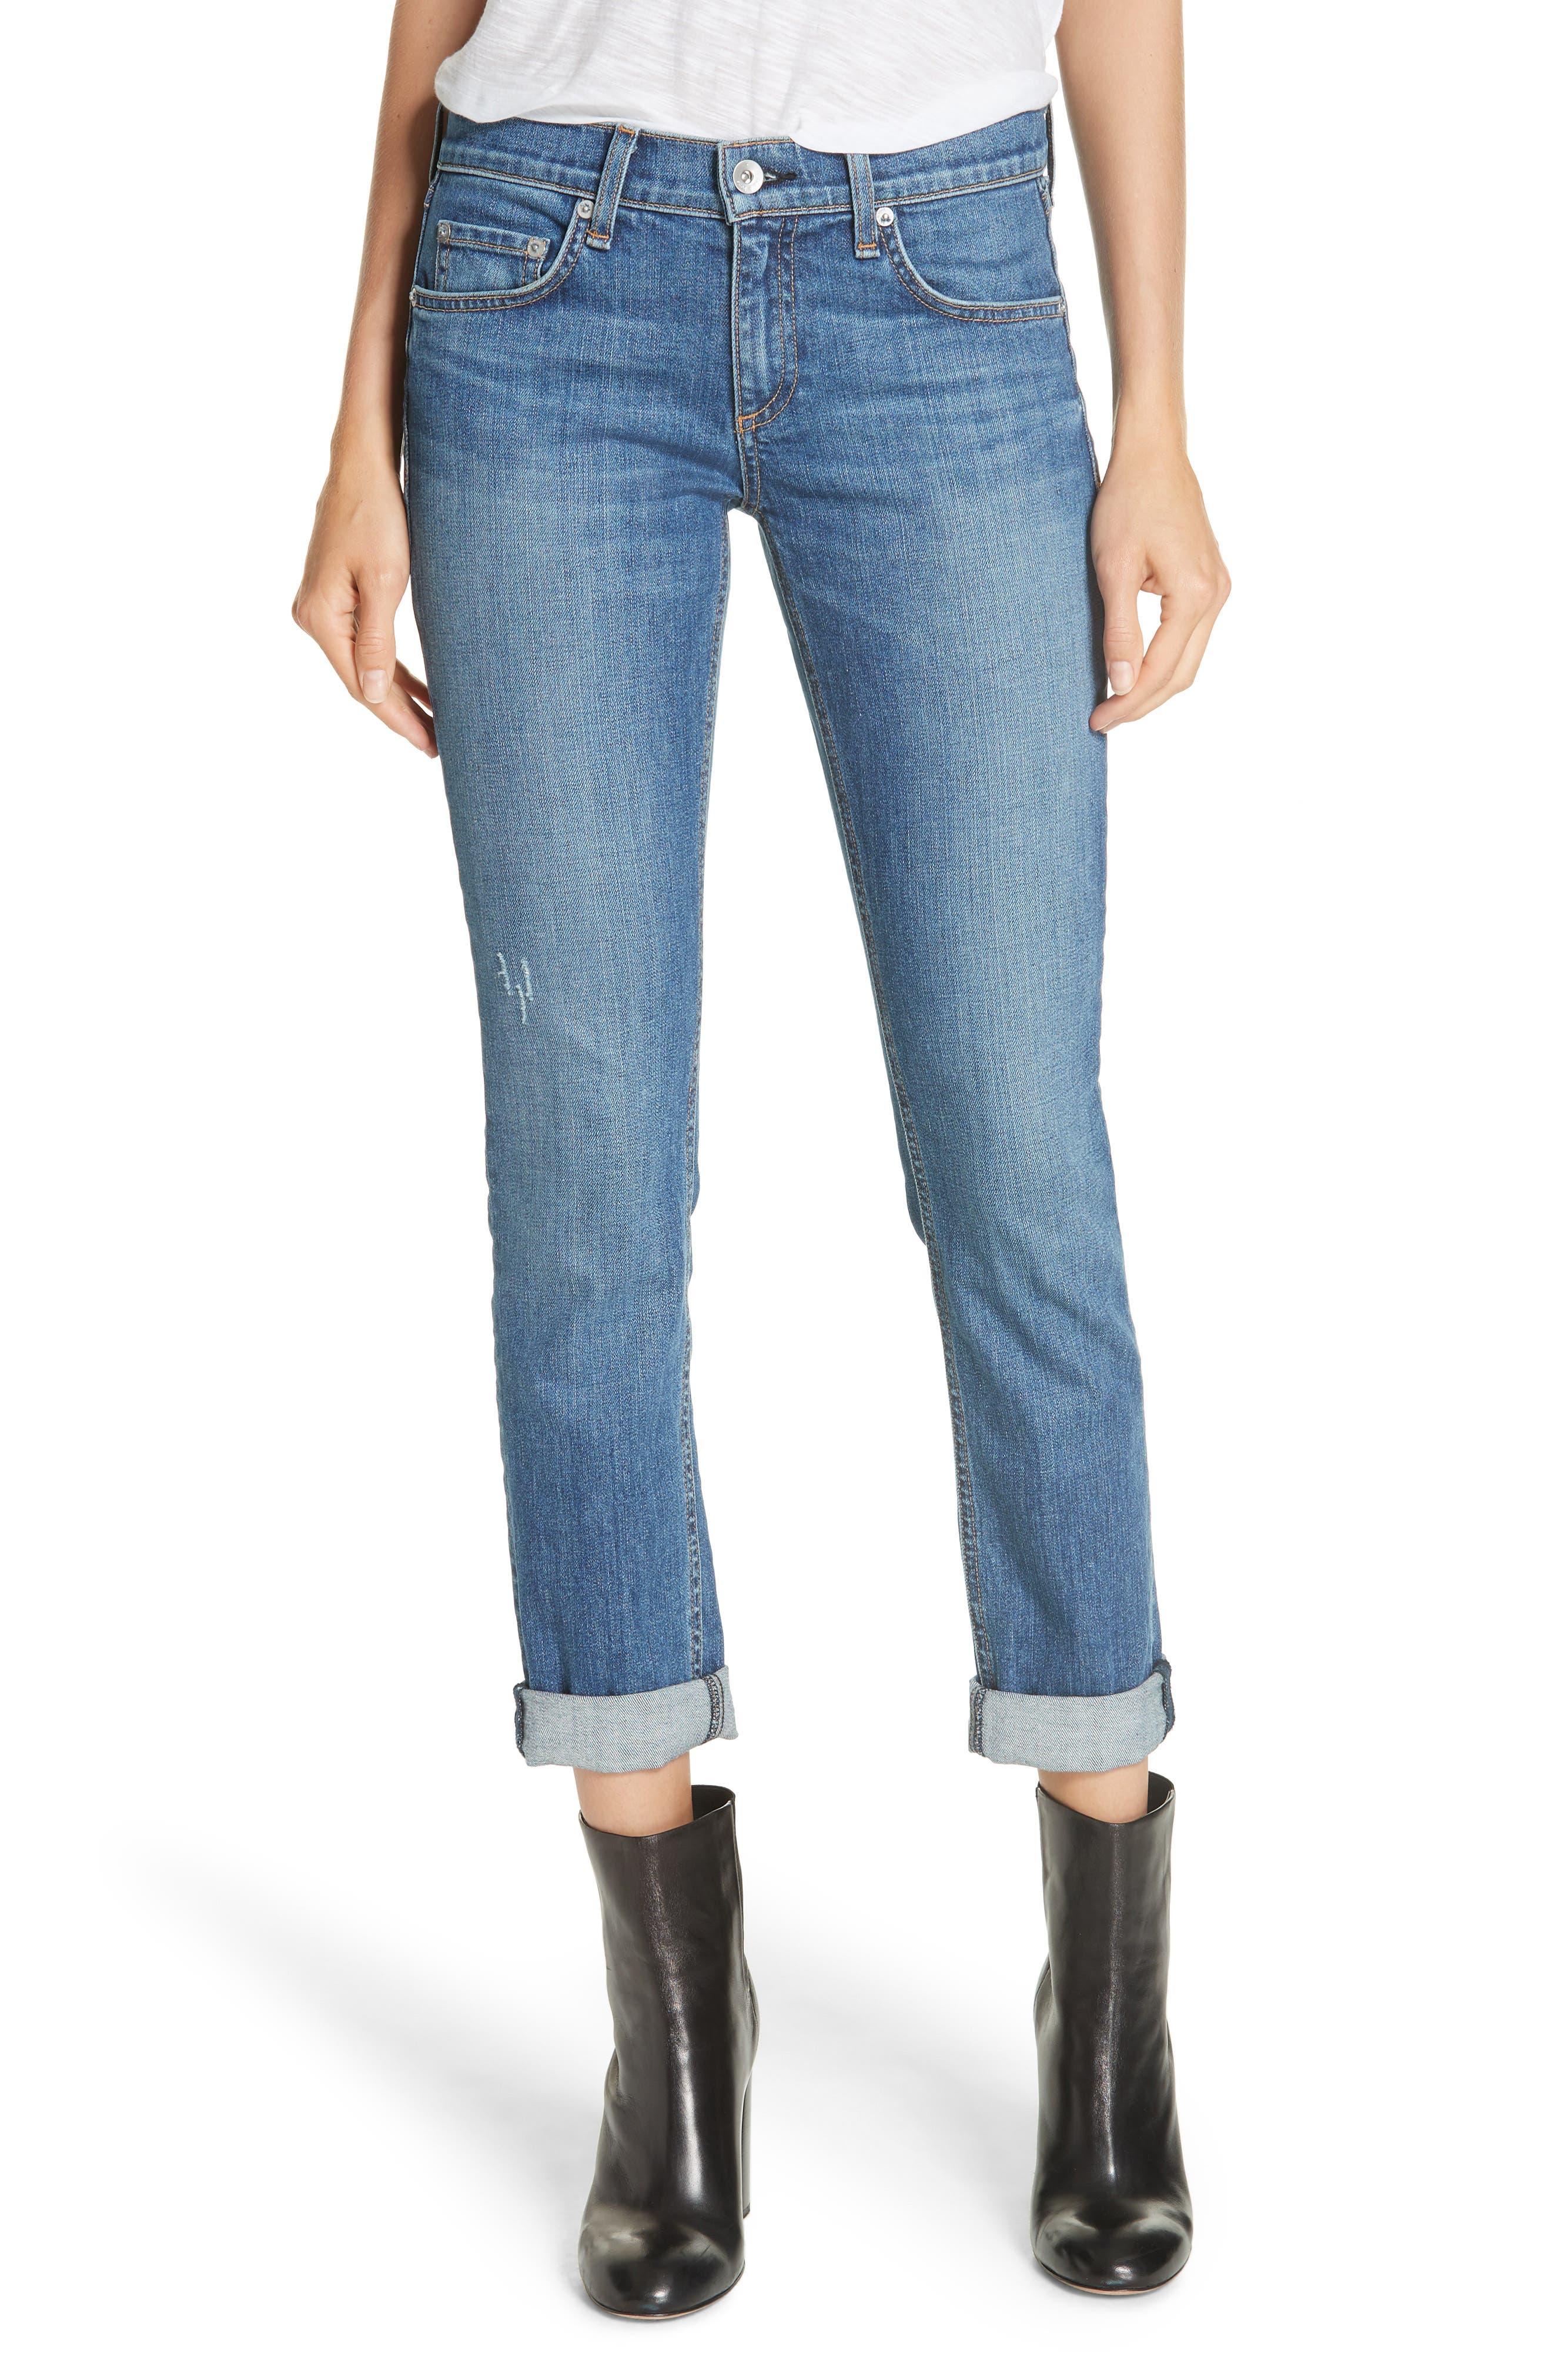 RAG & BONE Dre Slim Fit Boyfriend Jeans, Main, color, EL